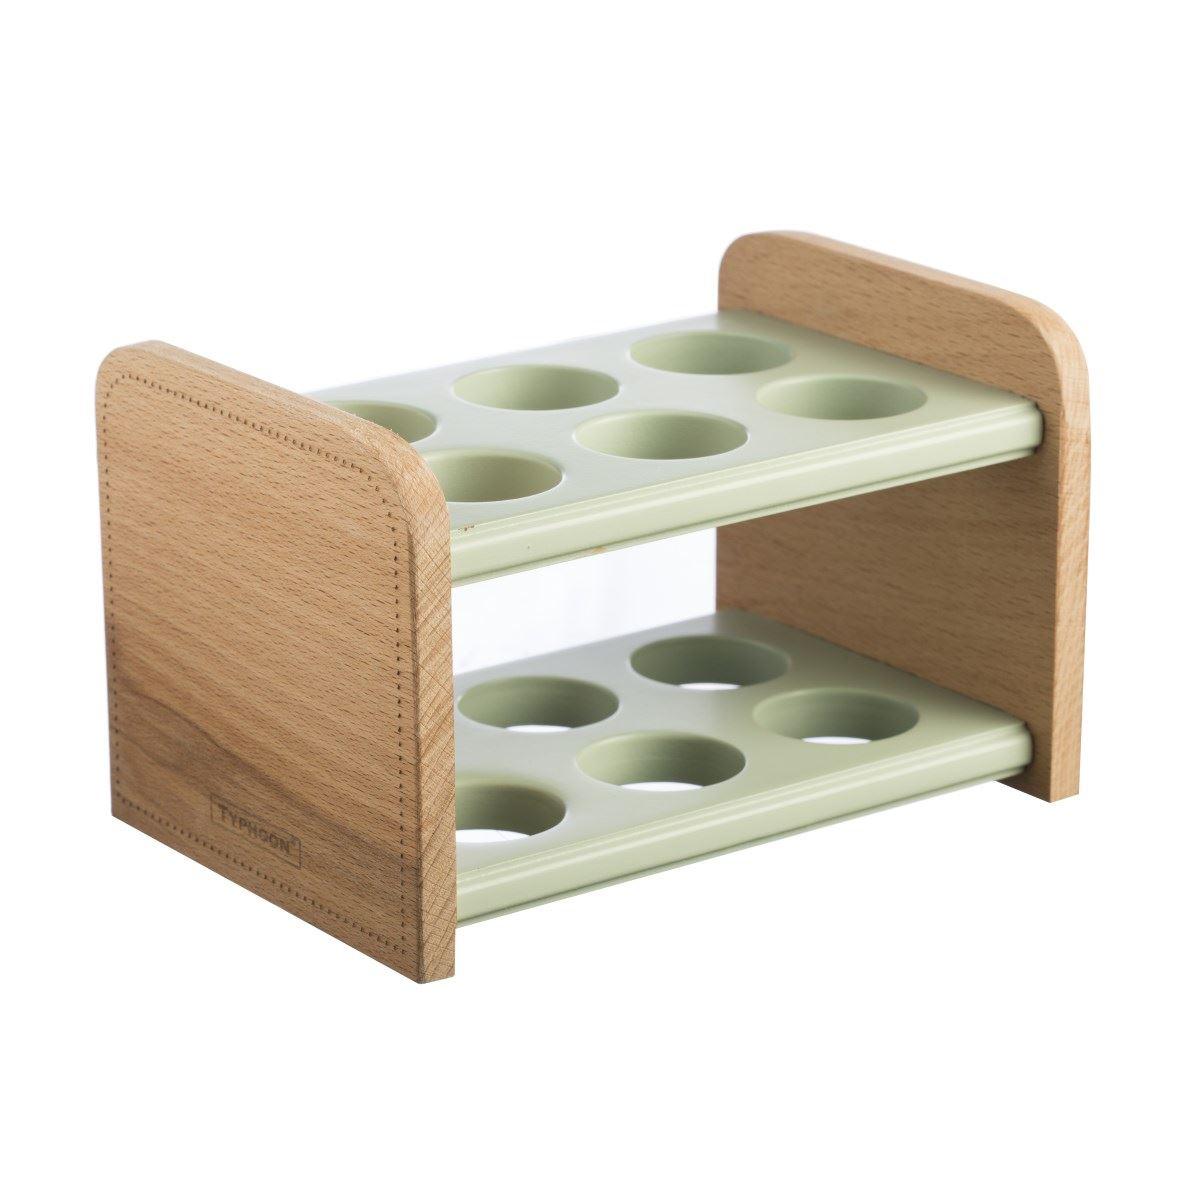 Typhoon Americana Wooden Storage Wine Rack, Egg Stand, Spice Rack or Spoon Rest | eBay